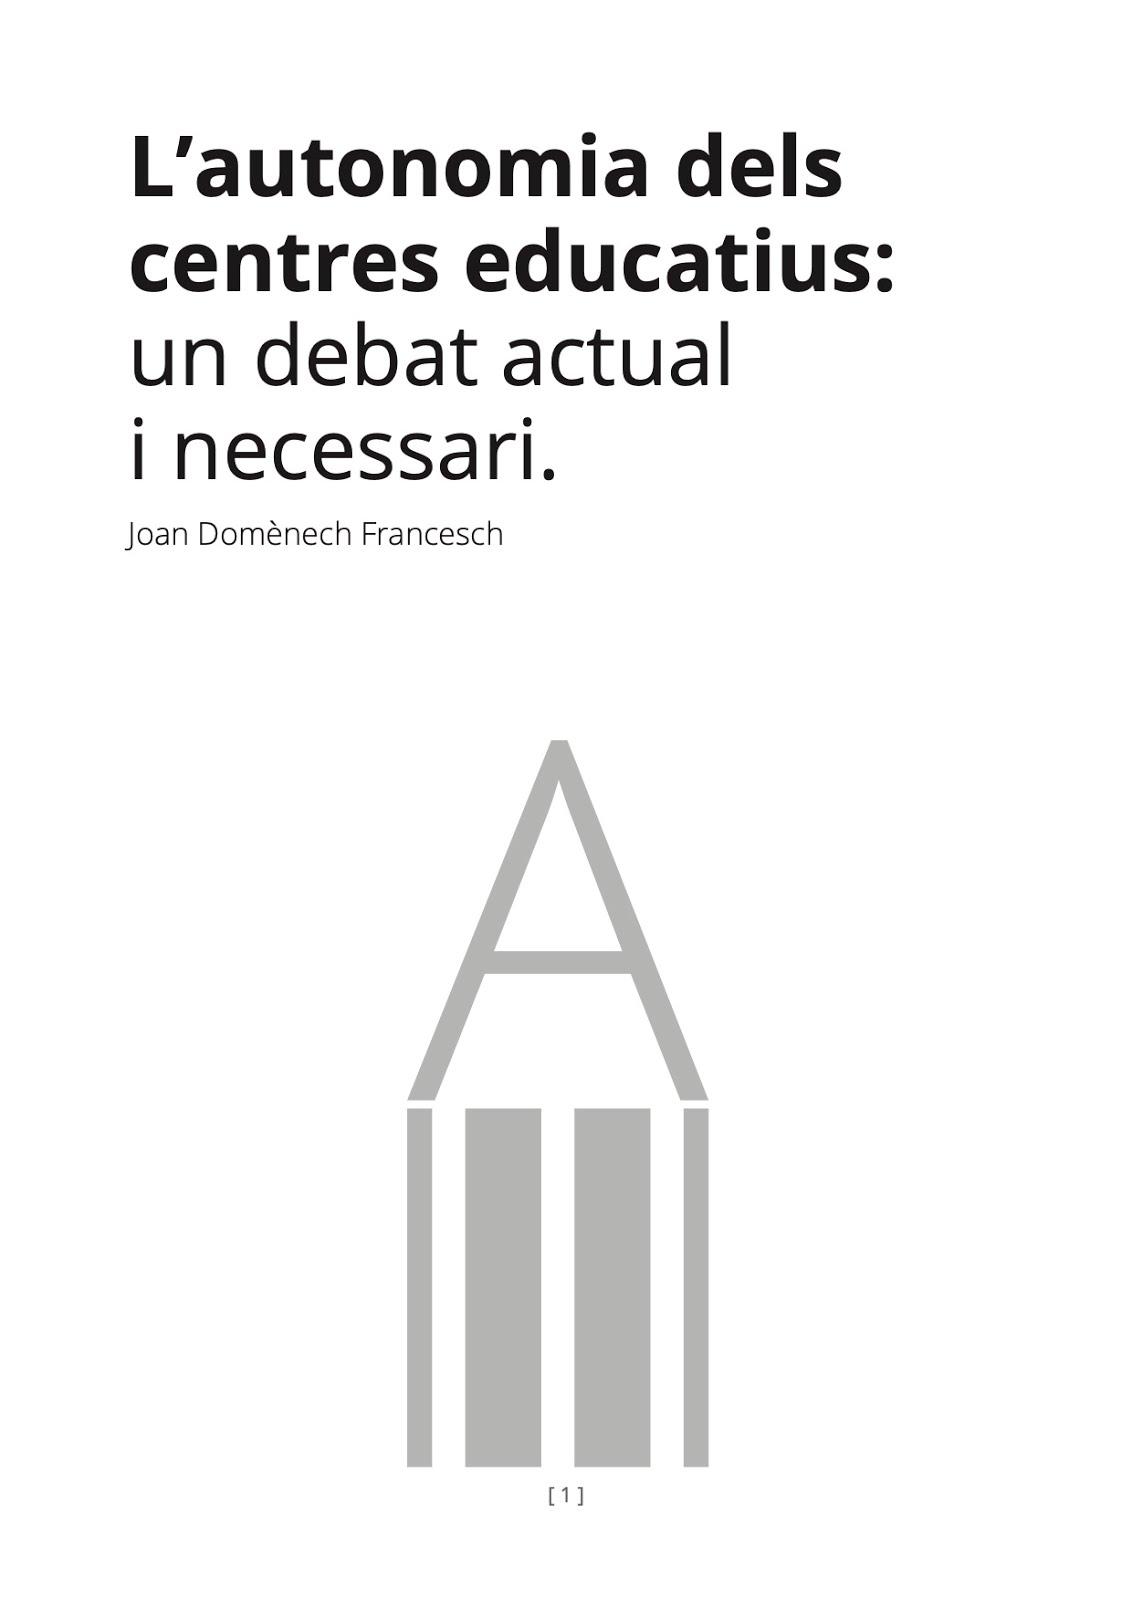 L'Autonomia dels centres educatius